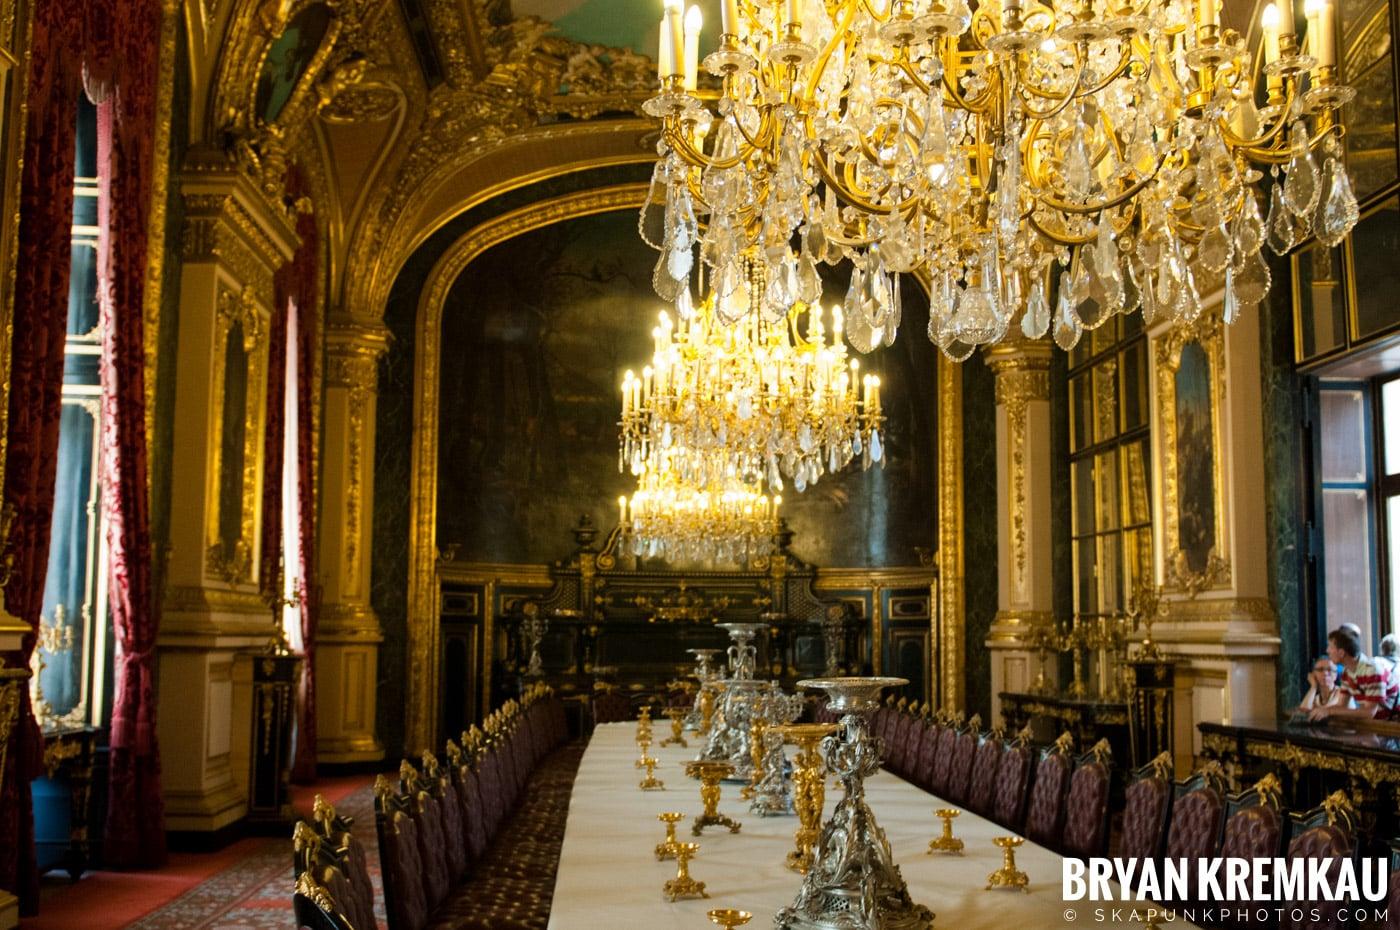 Paris, France Honeymoon - Day 3 - 7.20.11 (61)